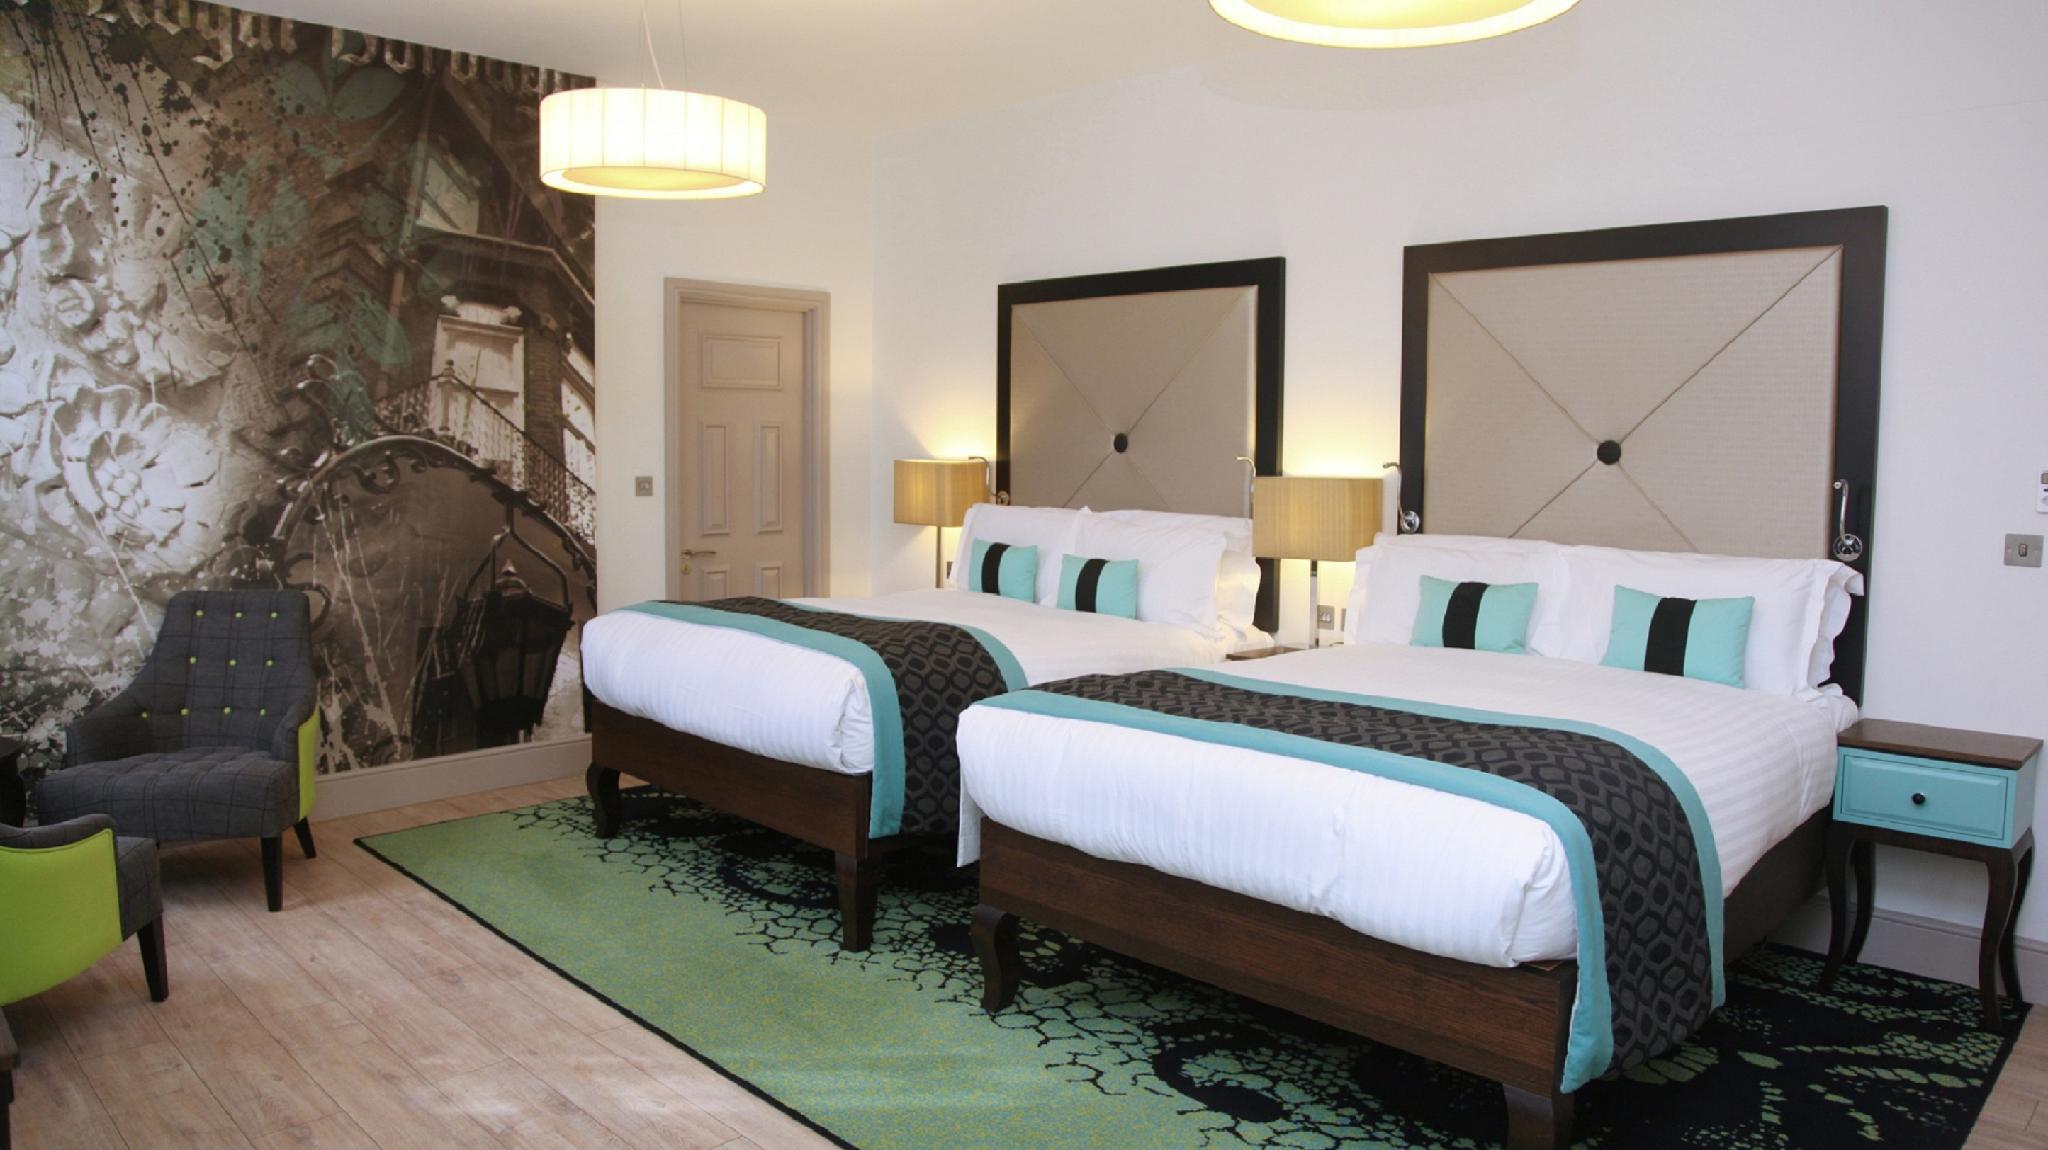 Hotel Indigo London - Kensington